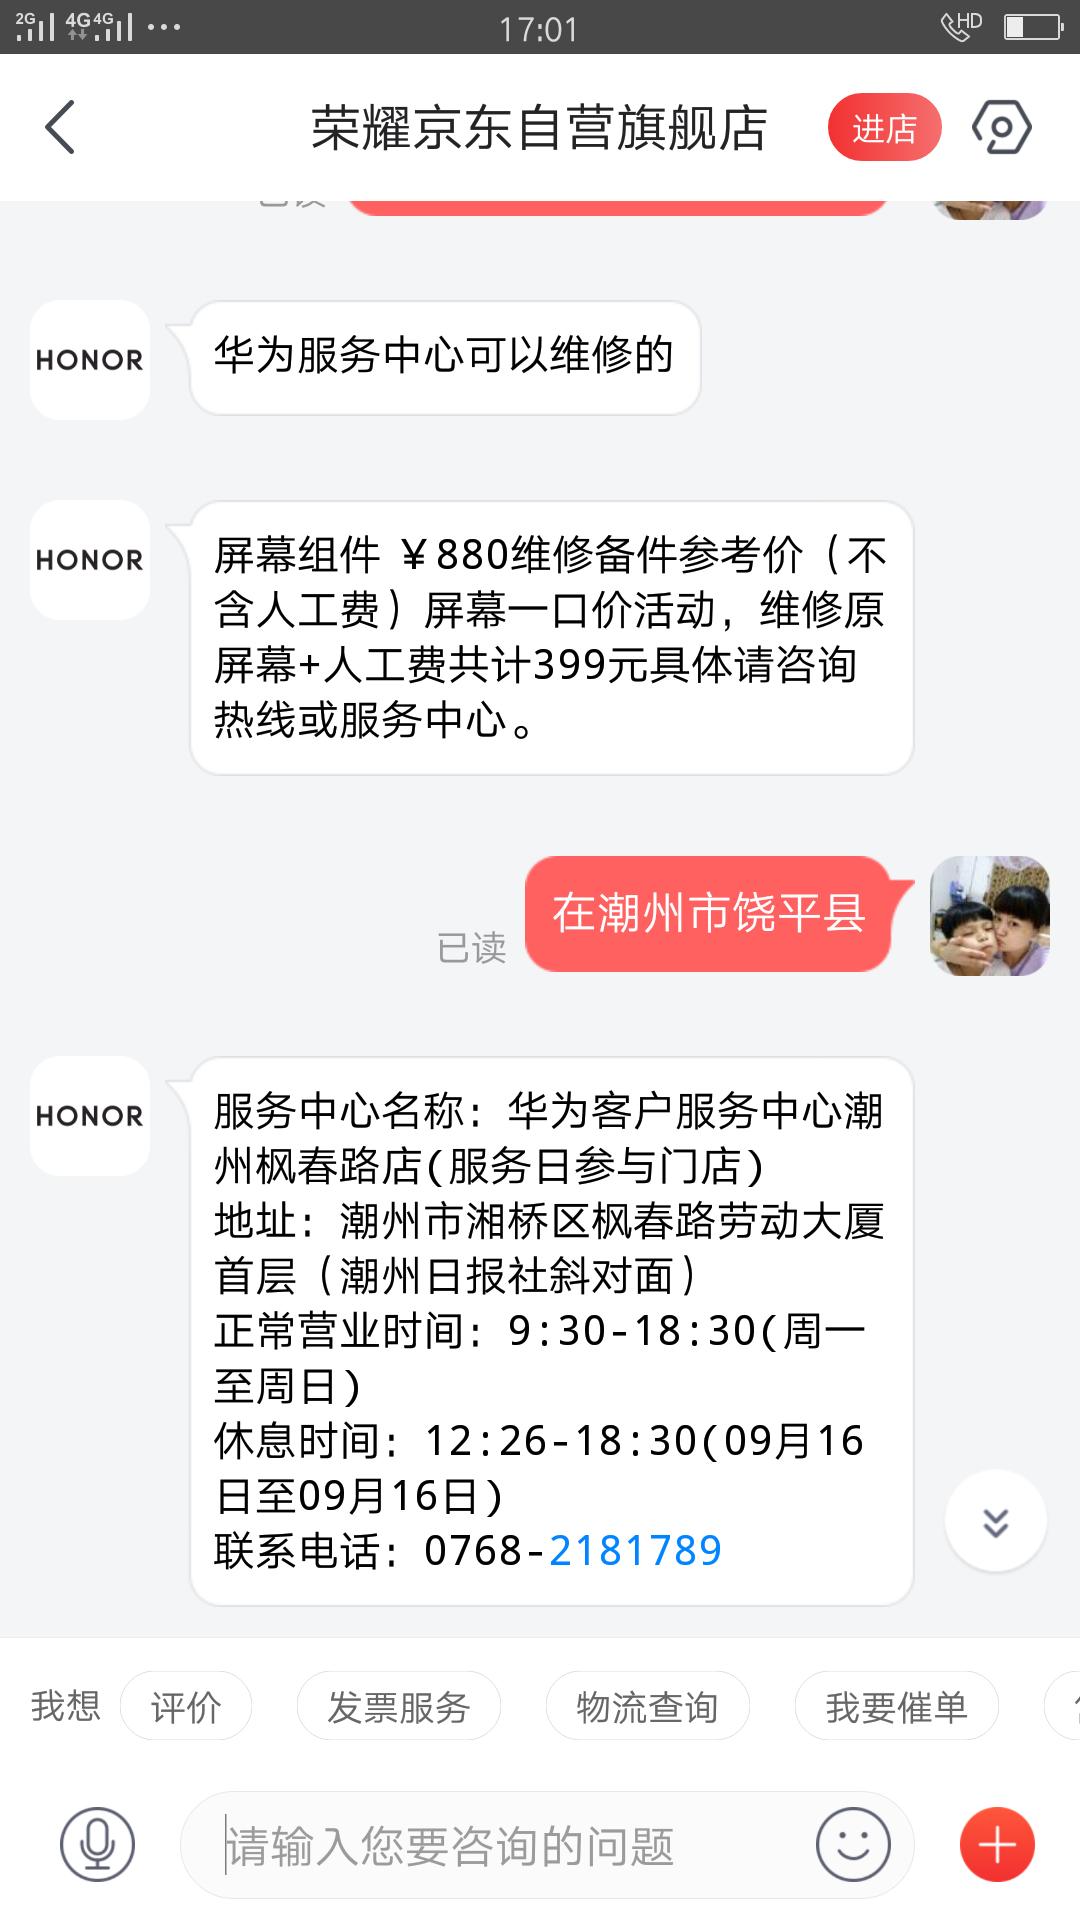 Screenshot_2019-08-24-17-01-12-20.png